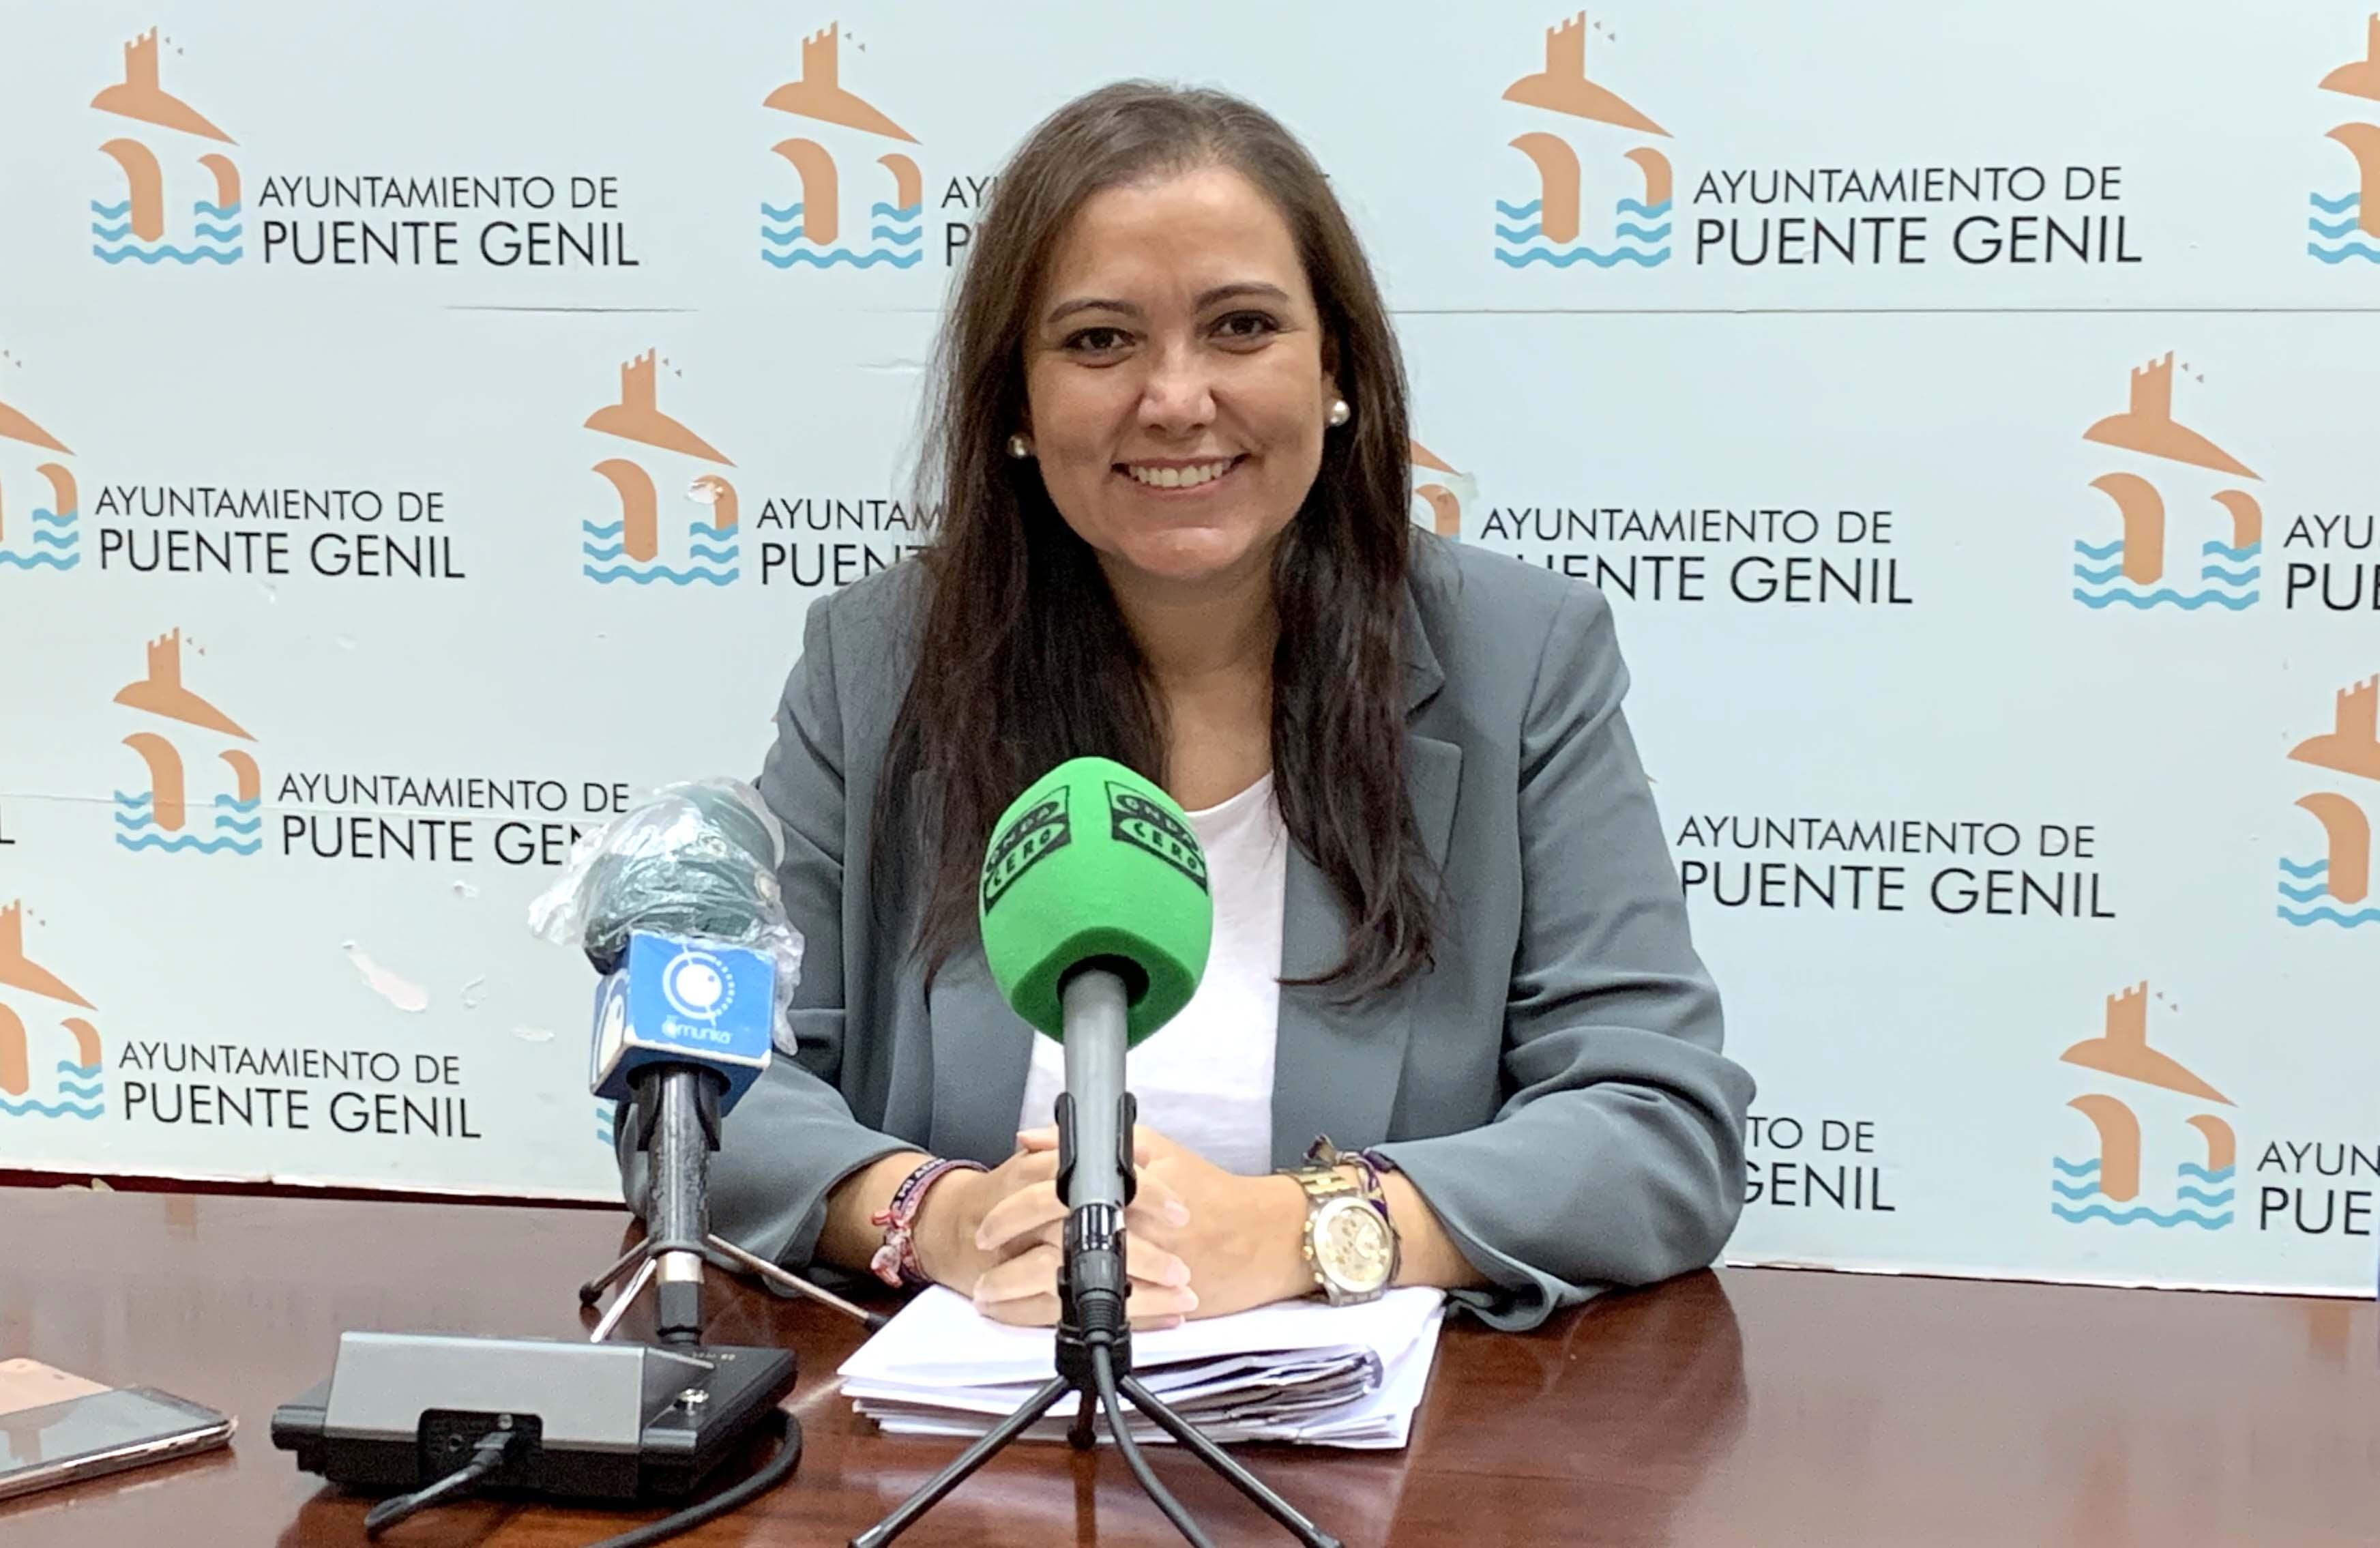 Ana Carrillo, concejala de Hacienda